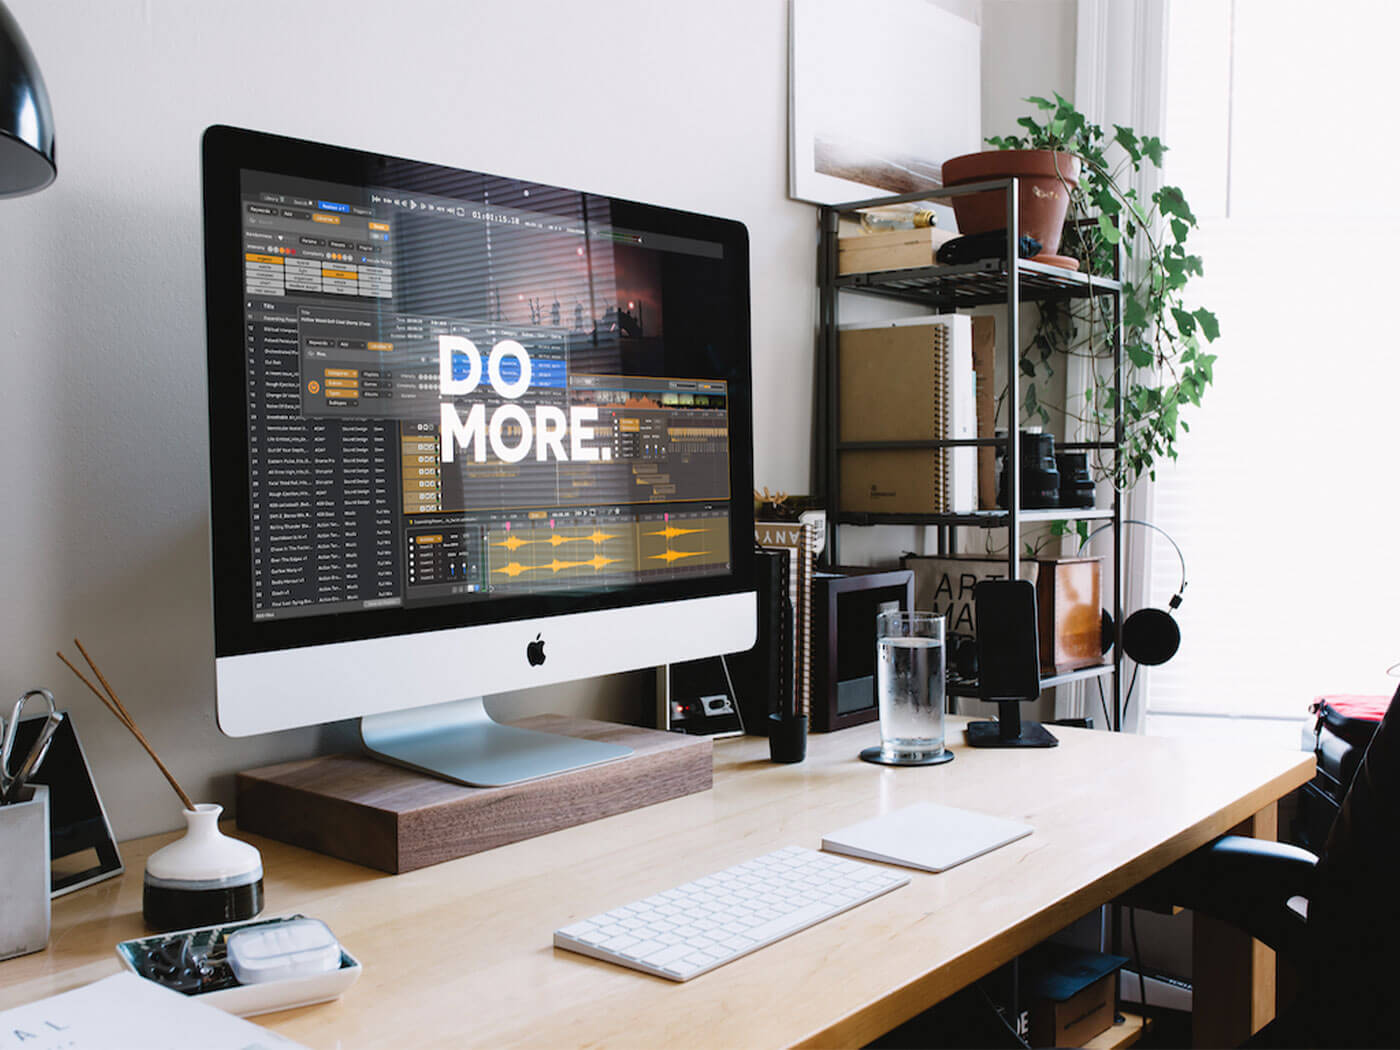 Audio Design Desk uses assistive AI to create audio for media and entertainment